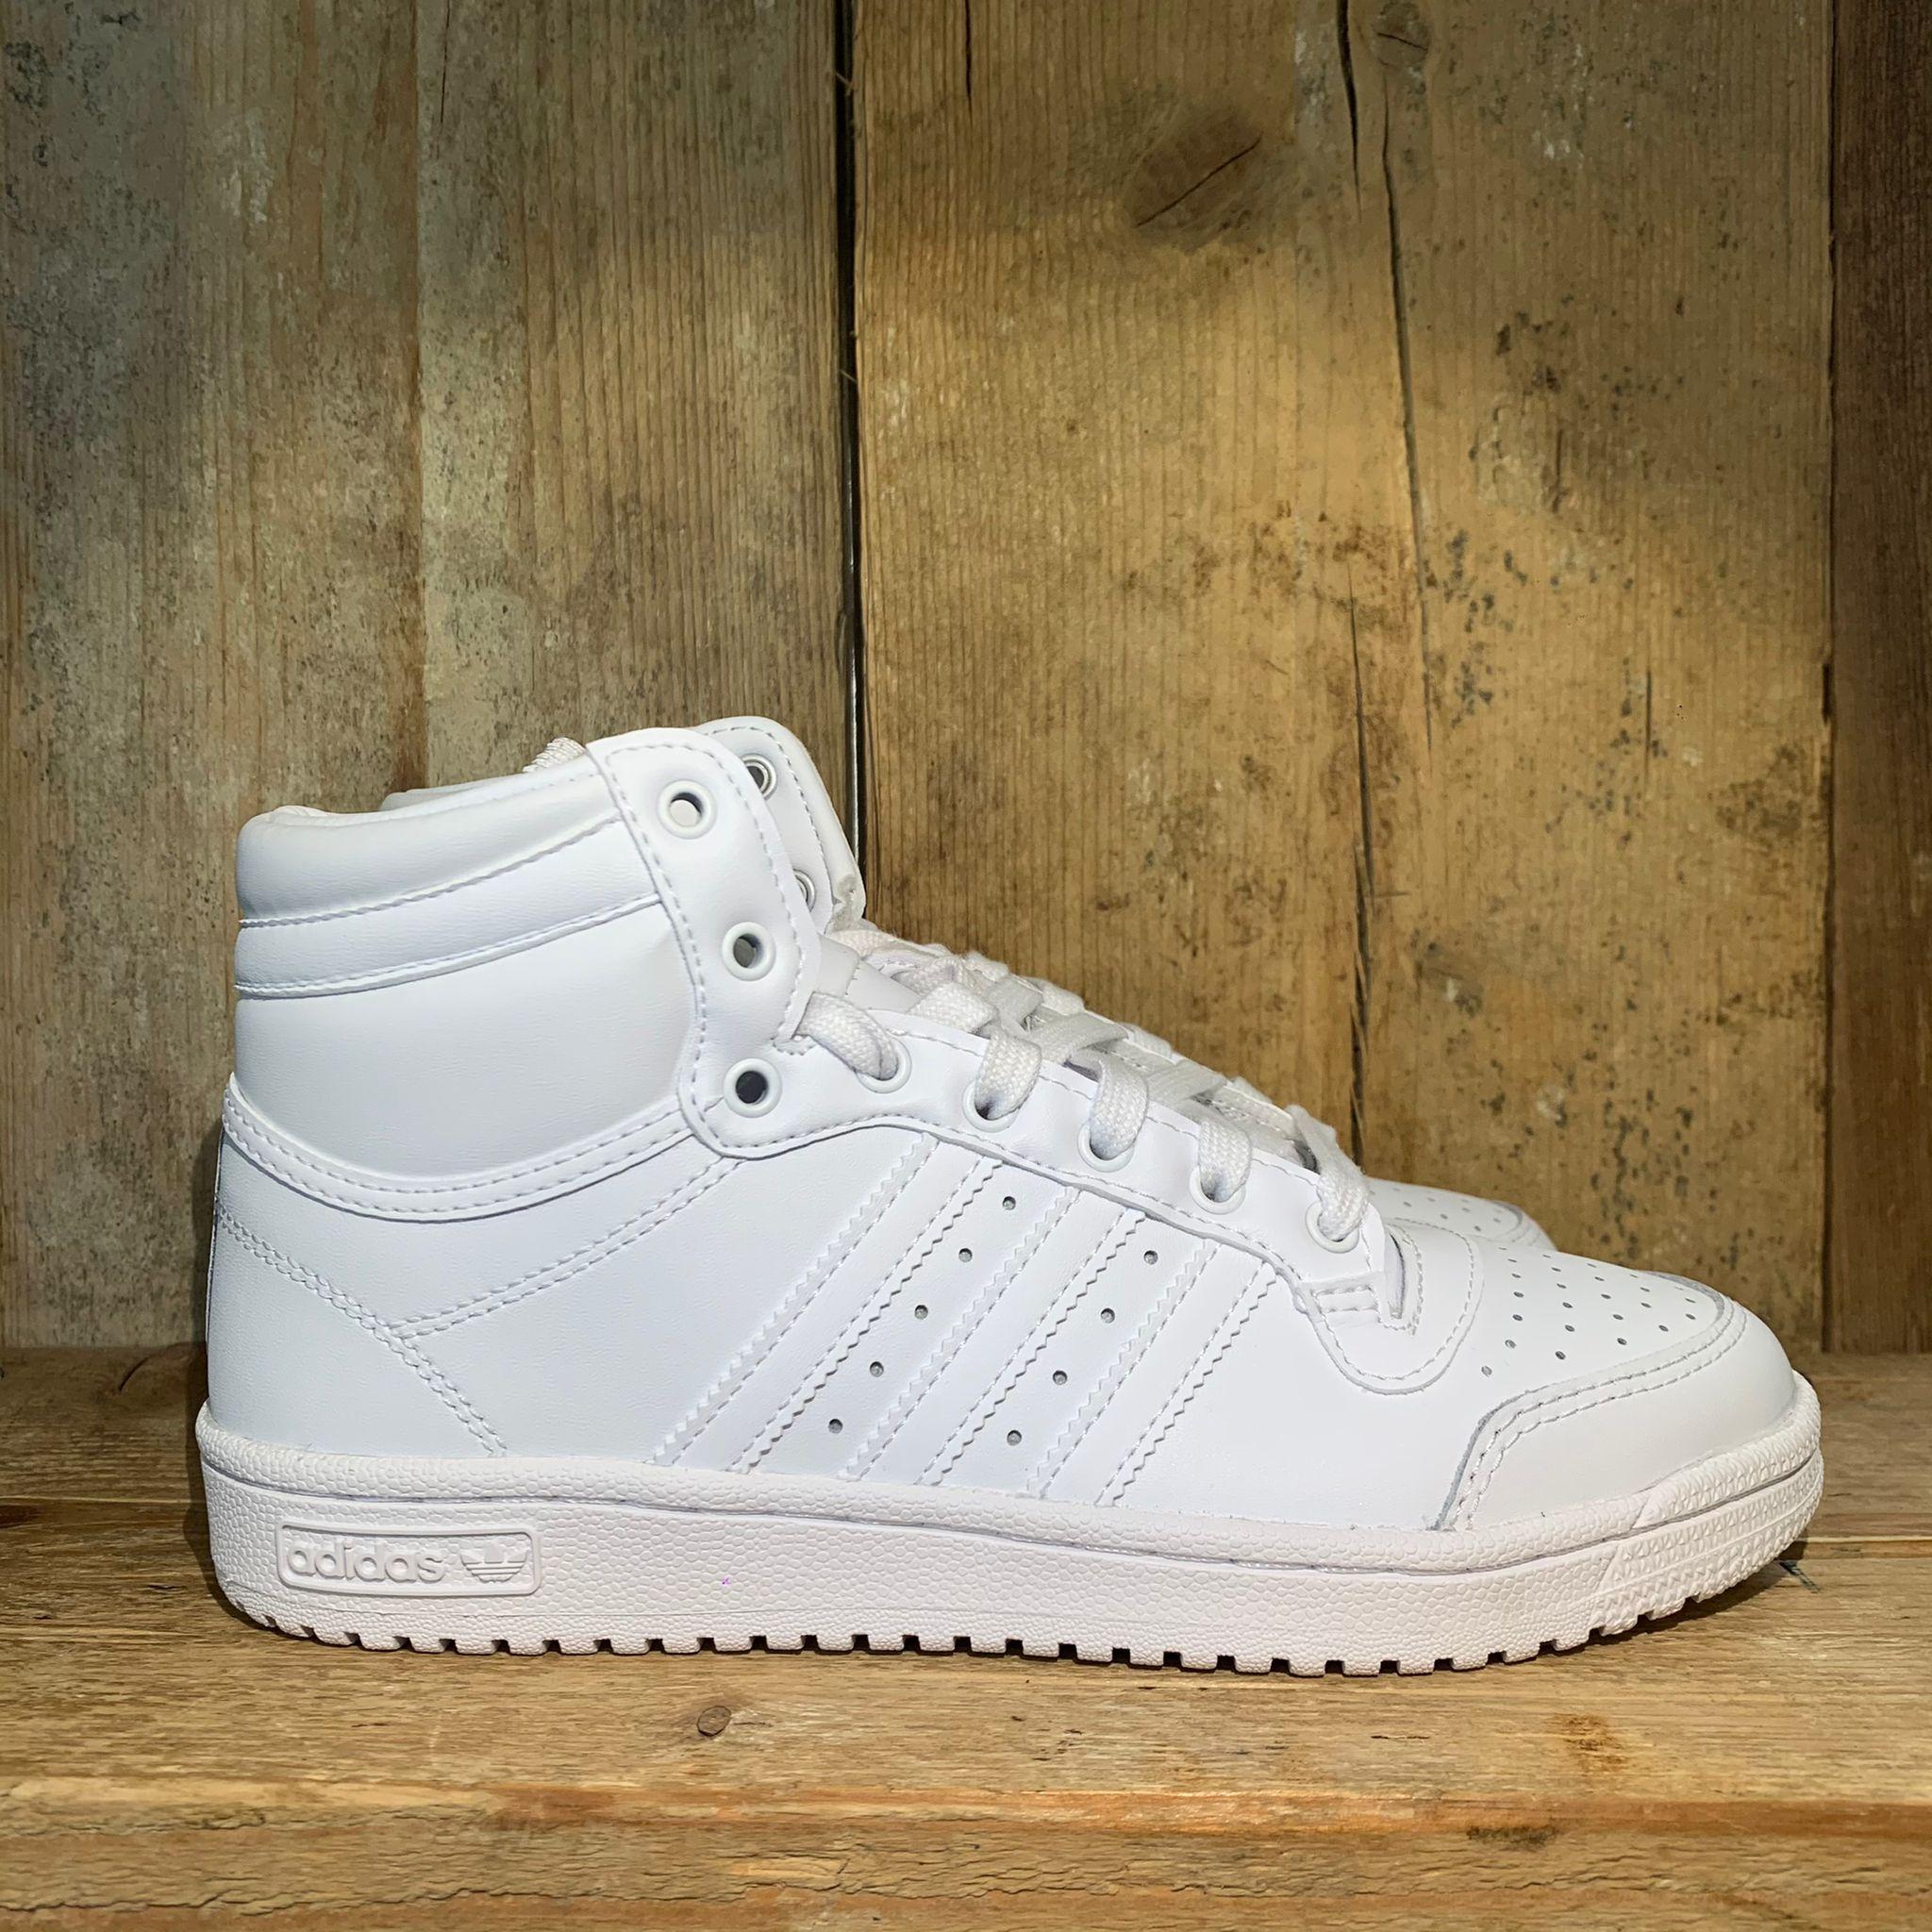 Scarpa Adidas Top Ten Hi J Bianca